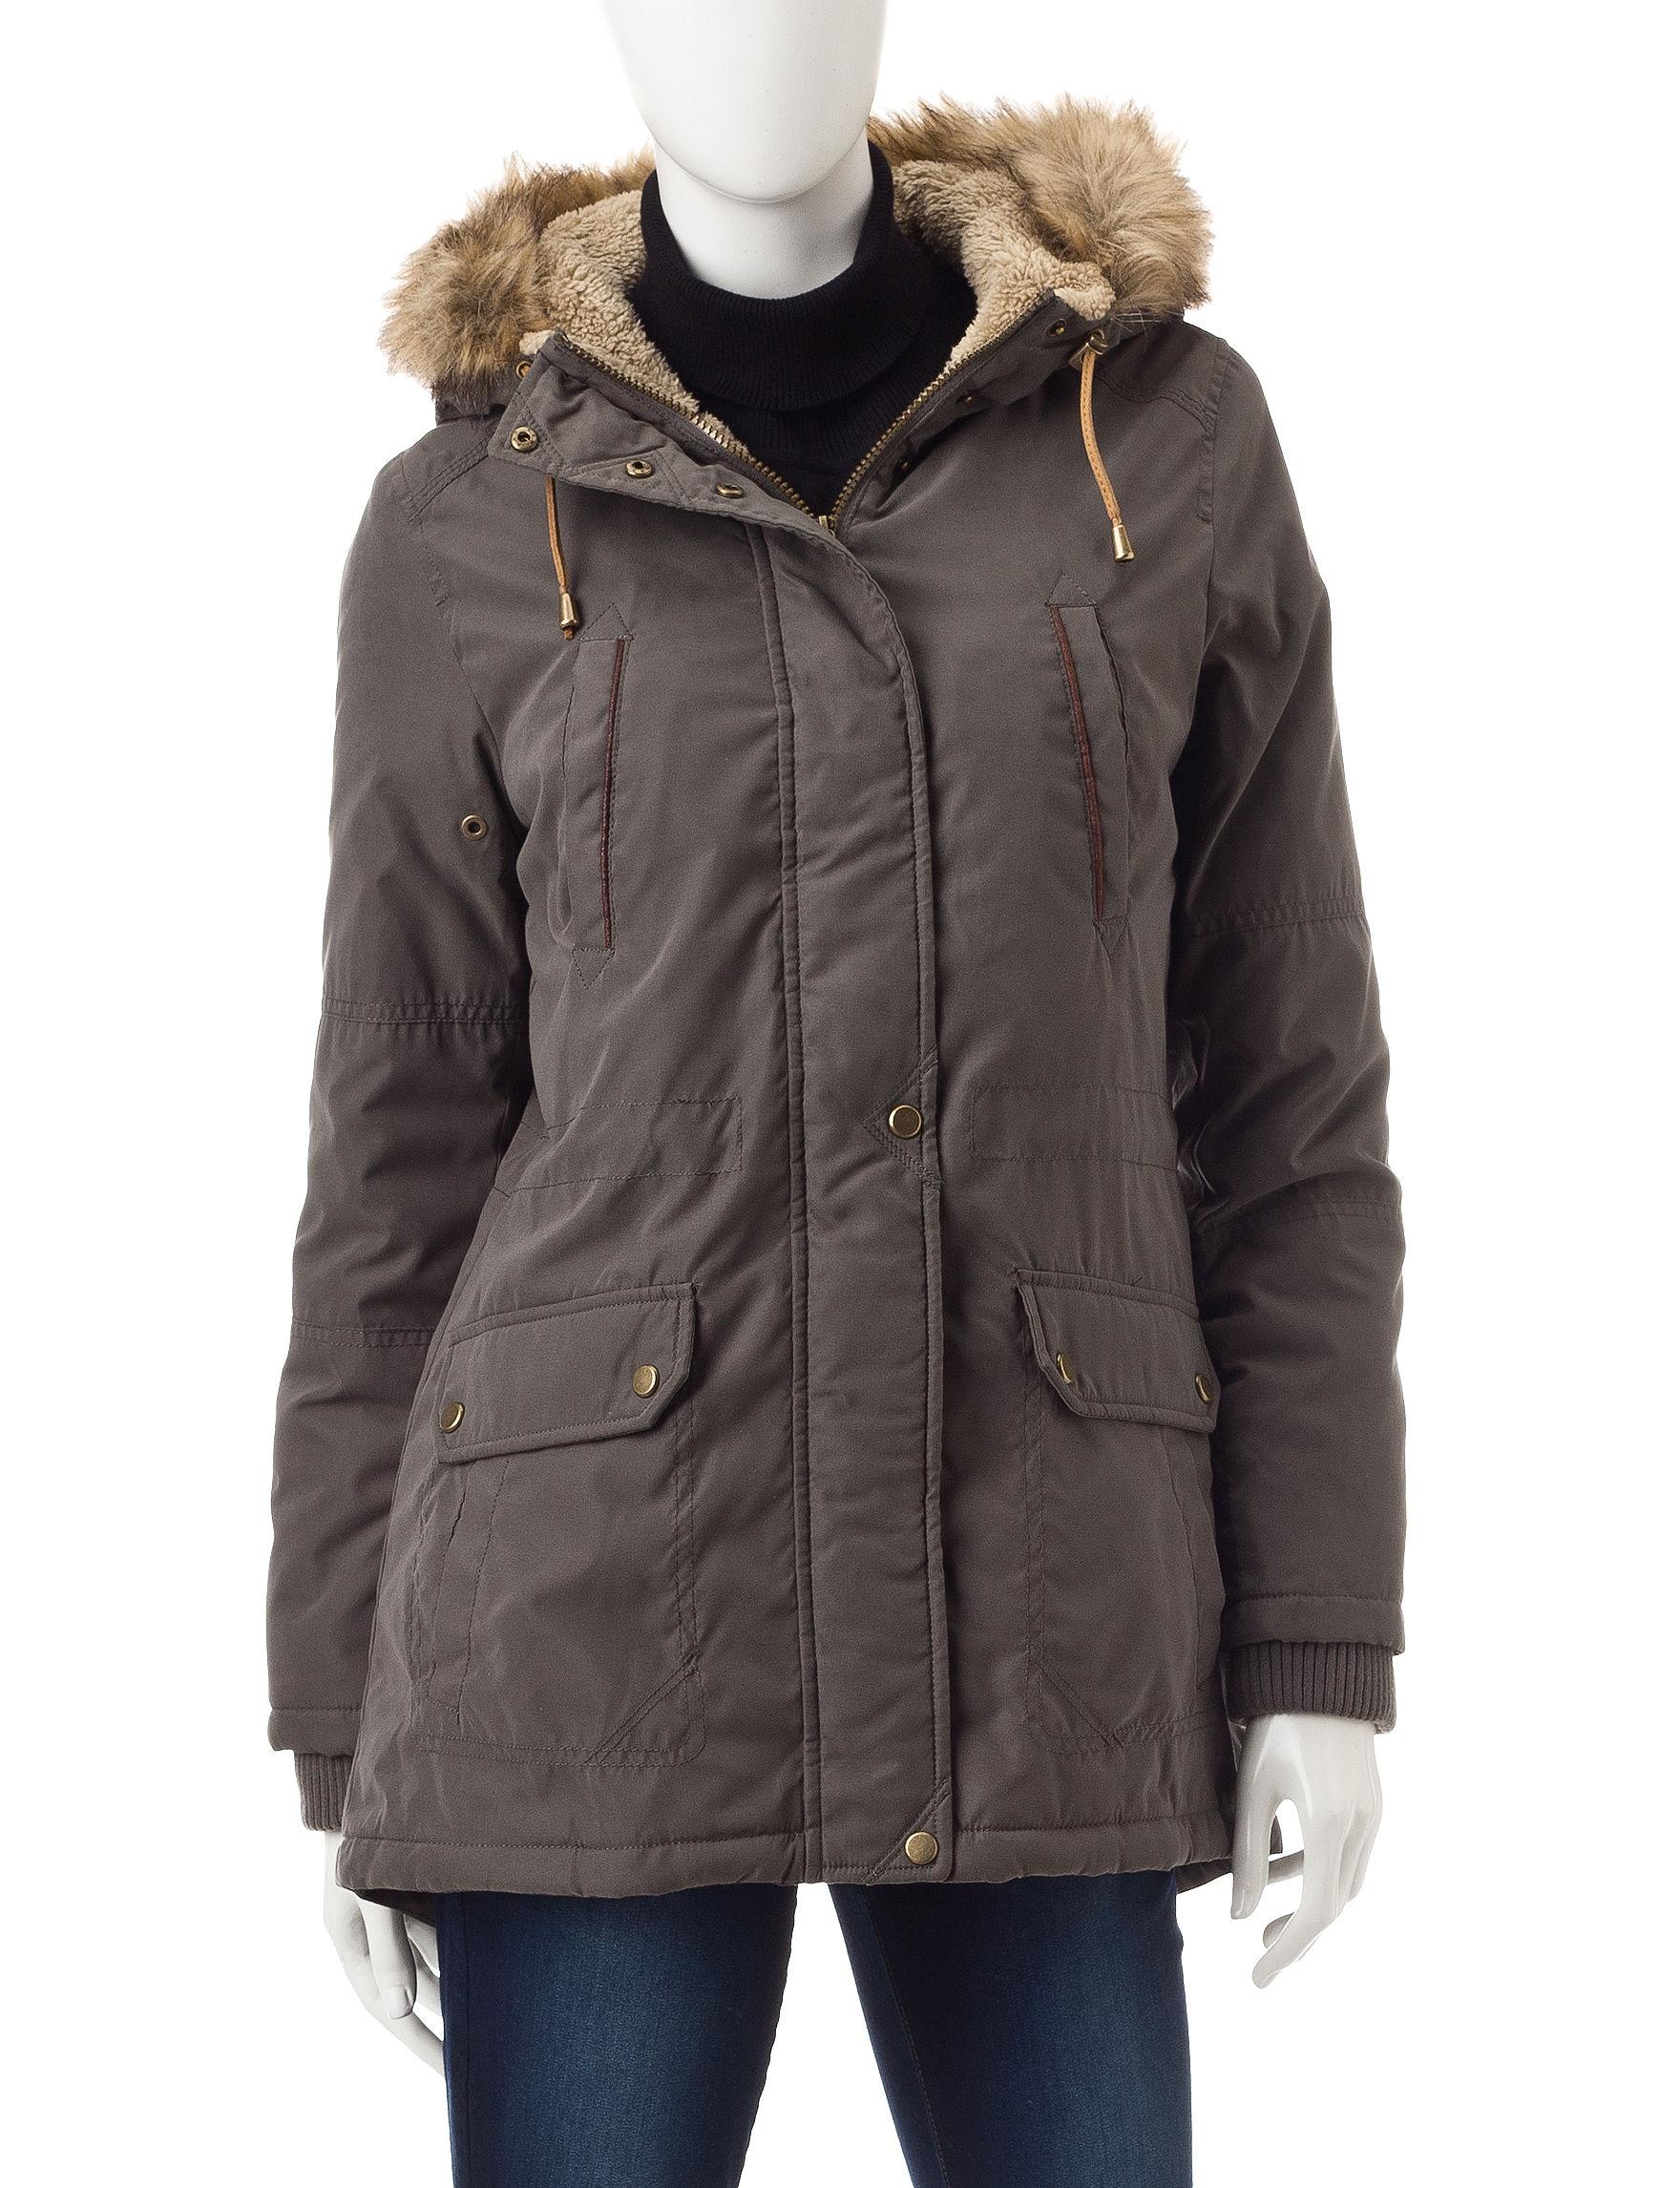 Valerie Stevens Grey Rain & Snow Jackets